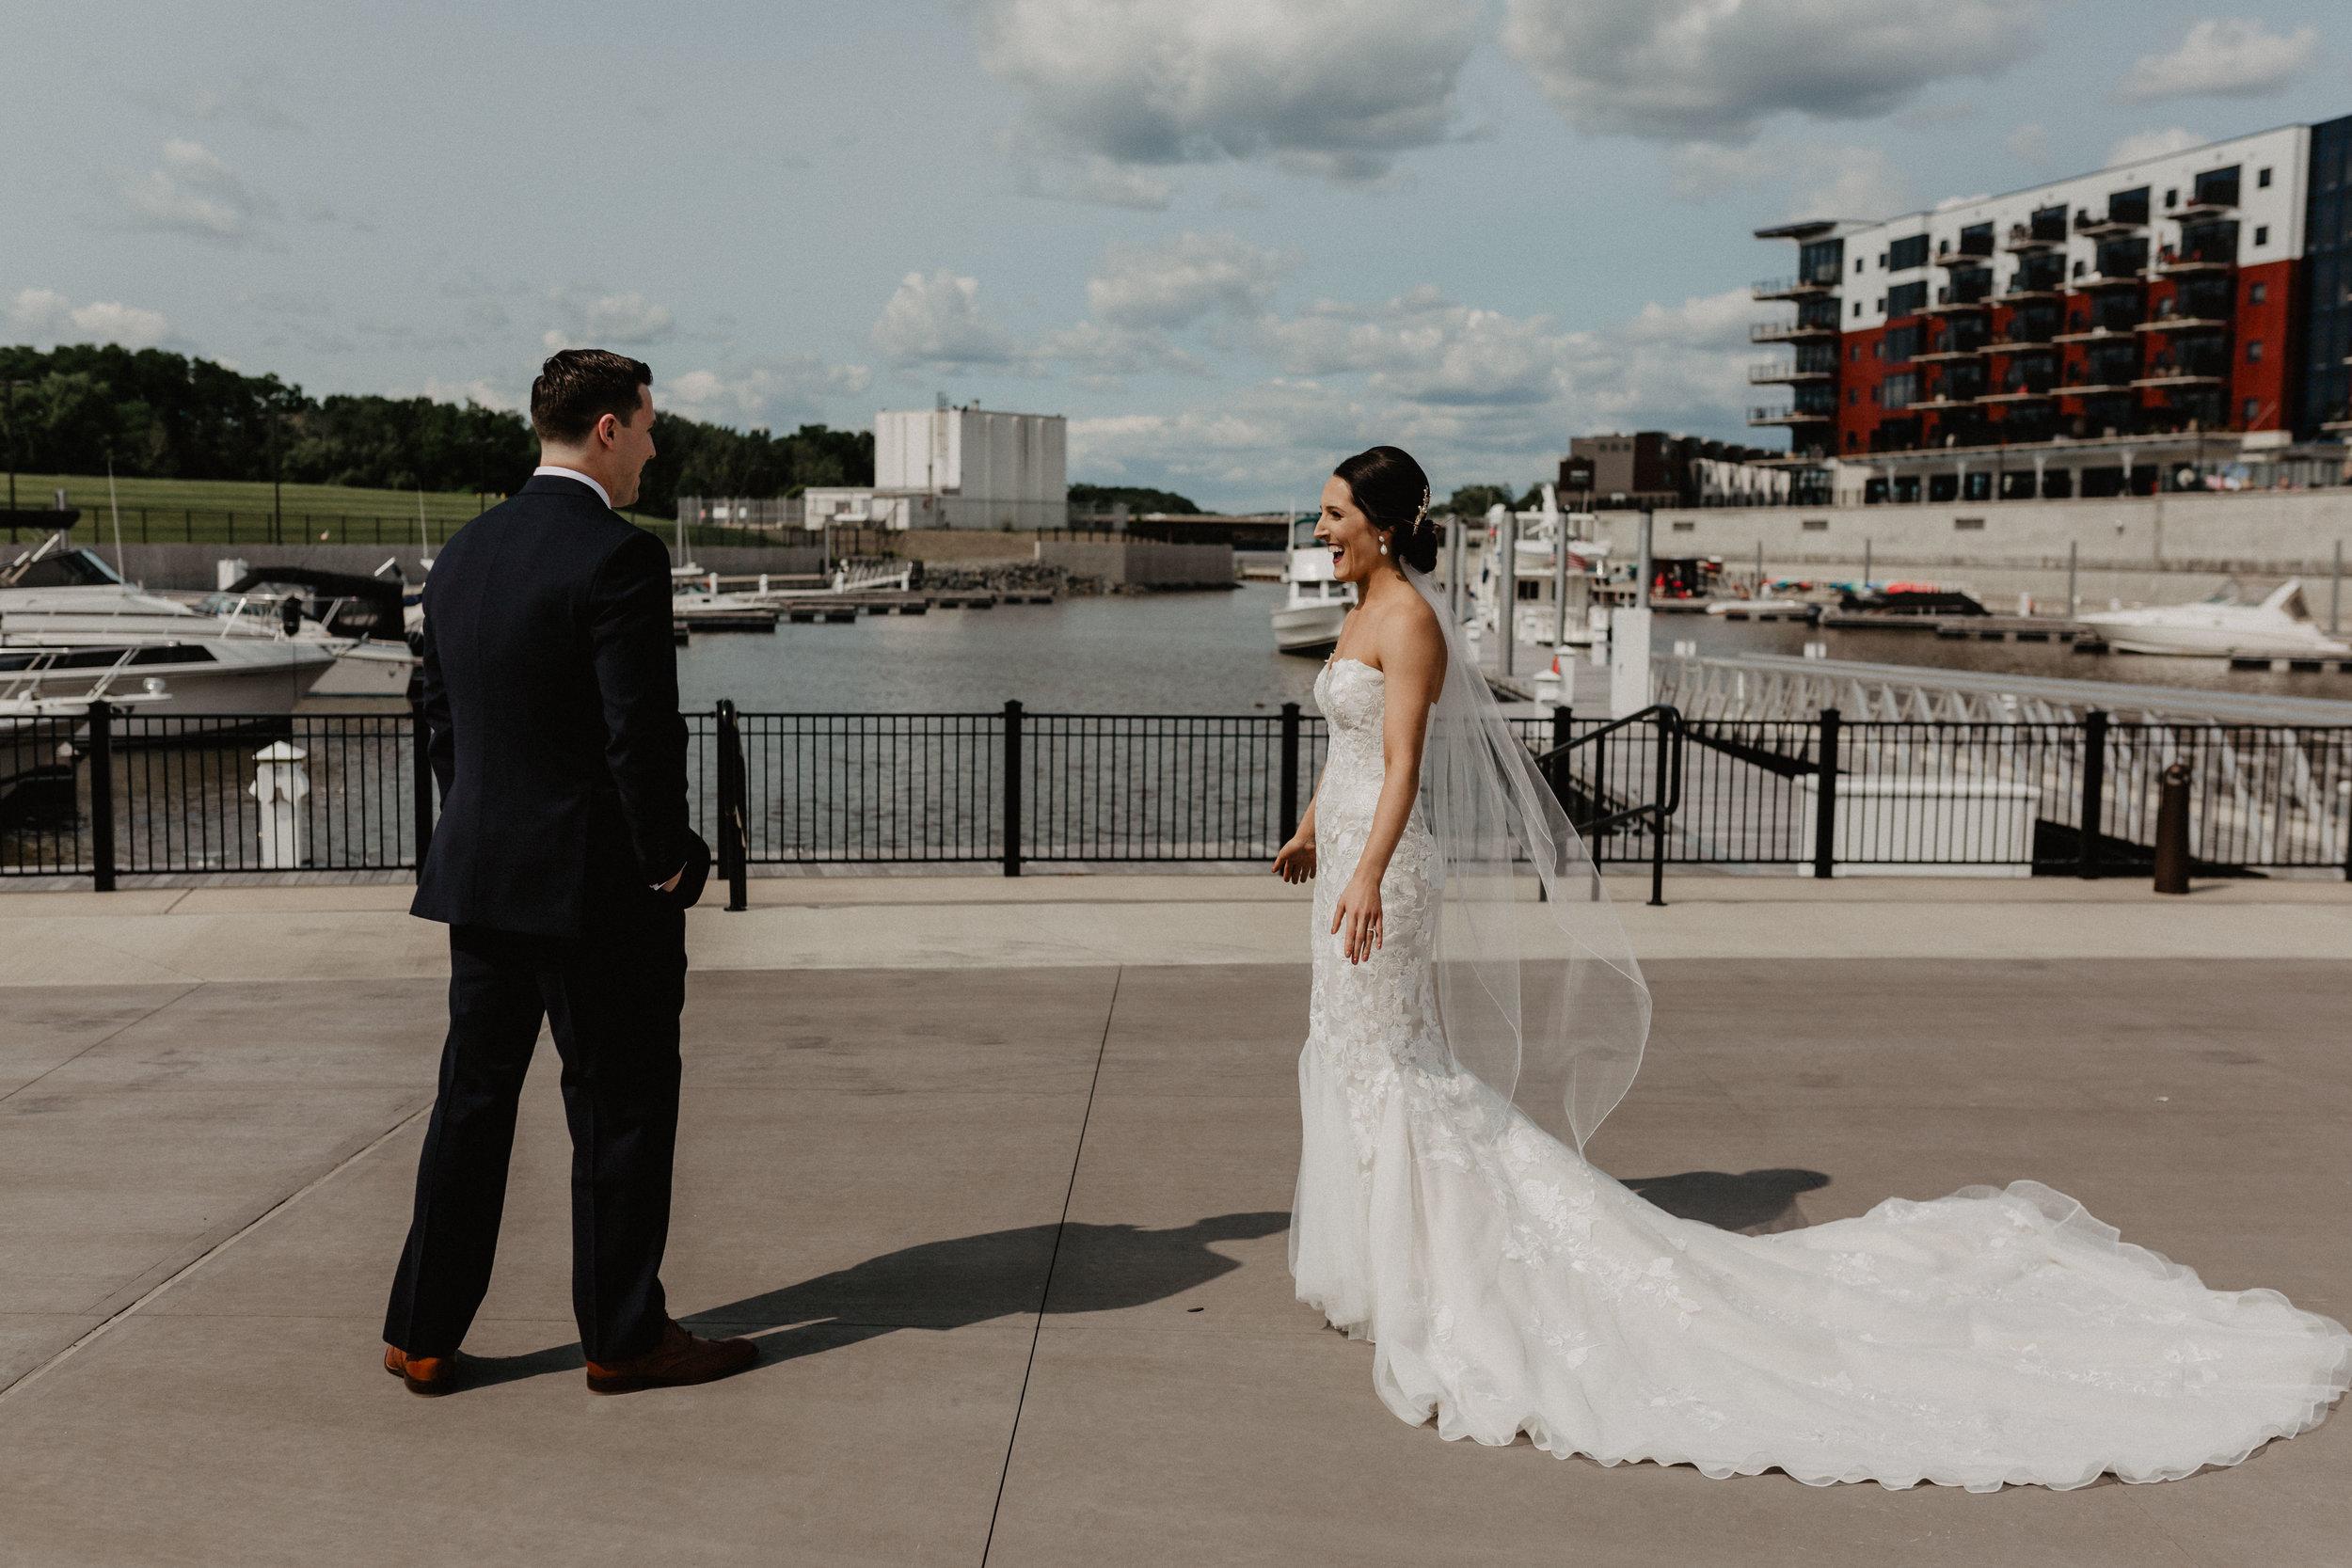 river-stone-manor-wedding_024.jpg